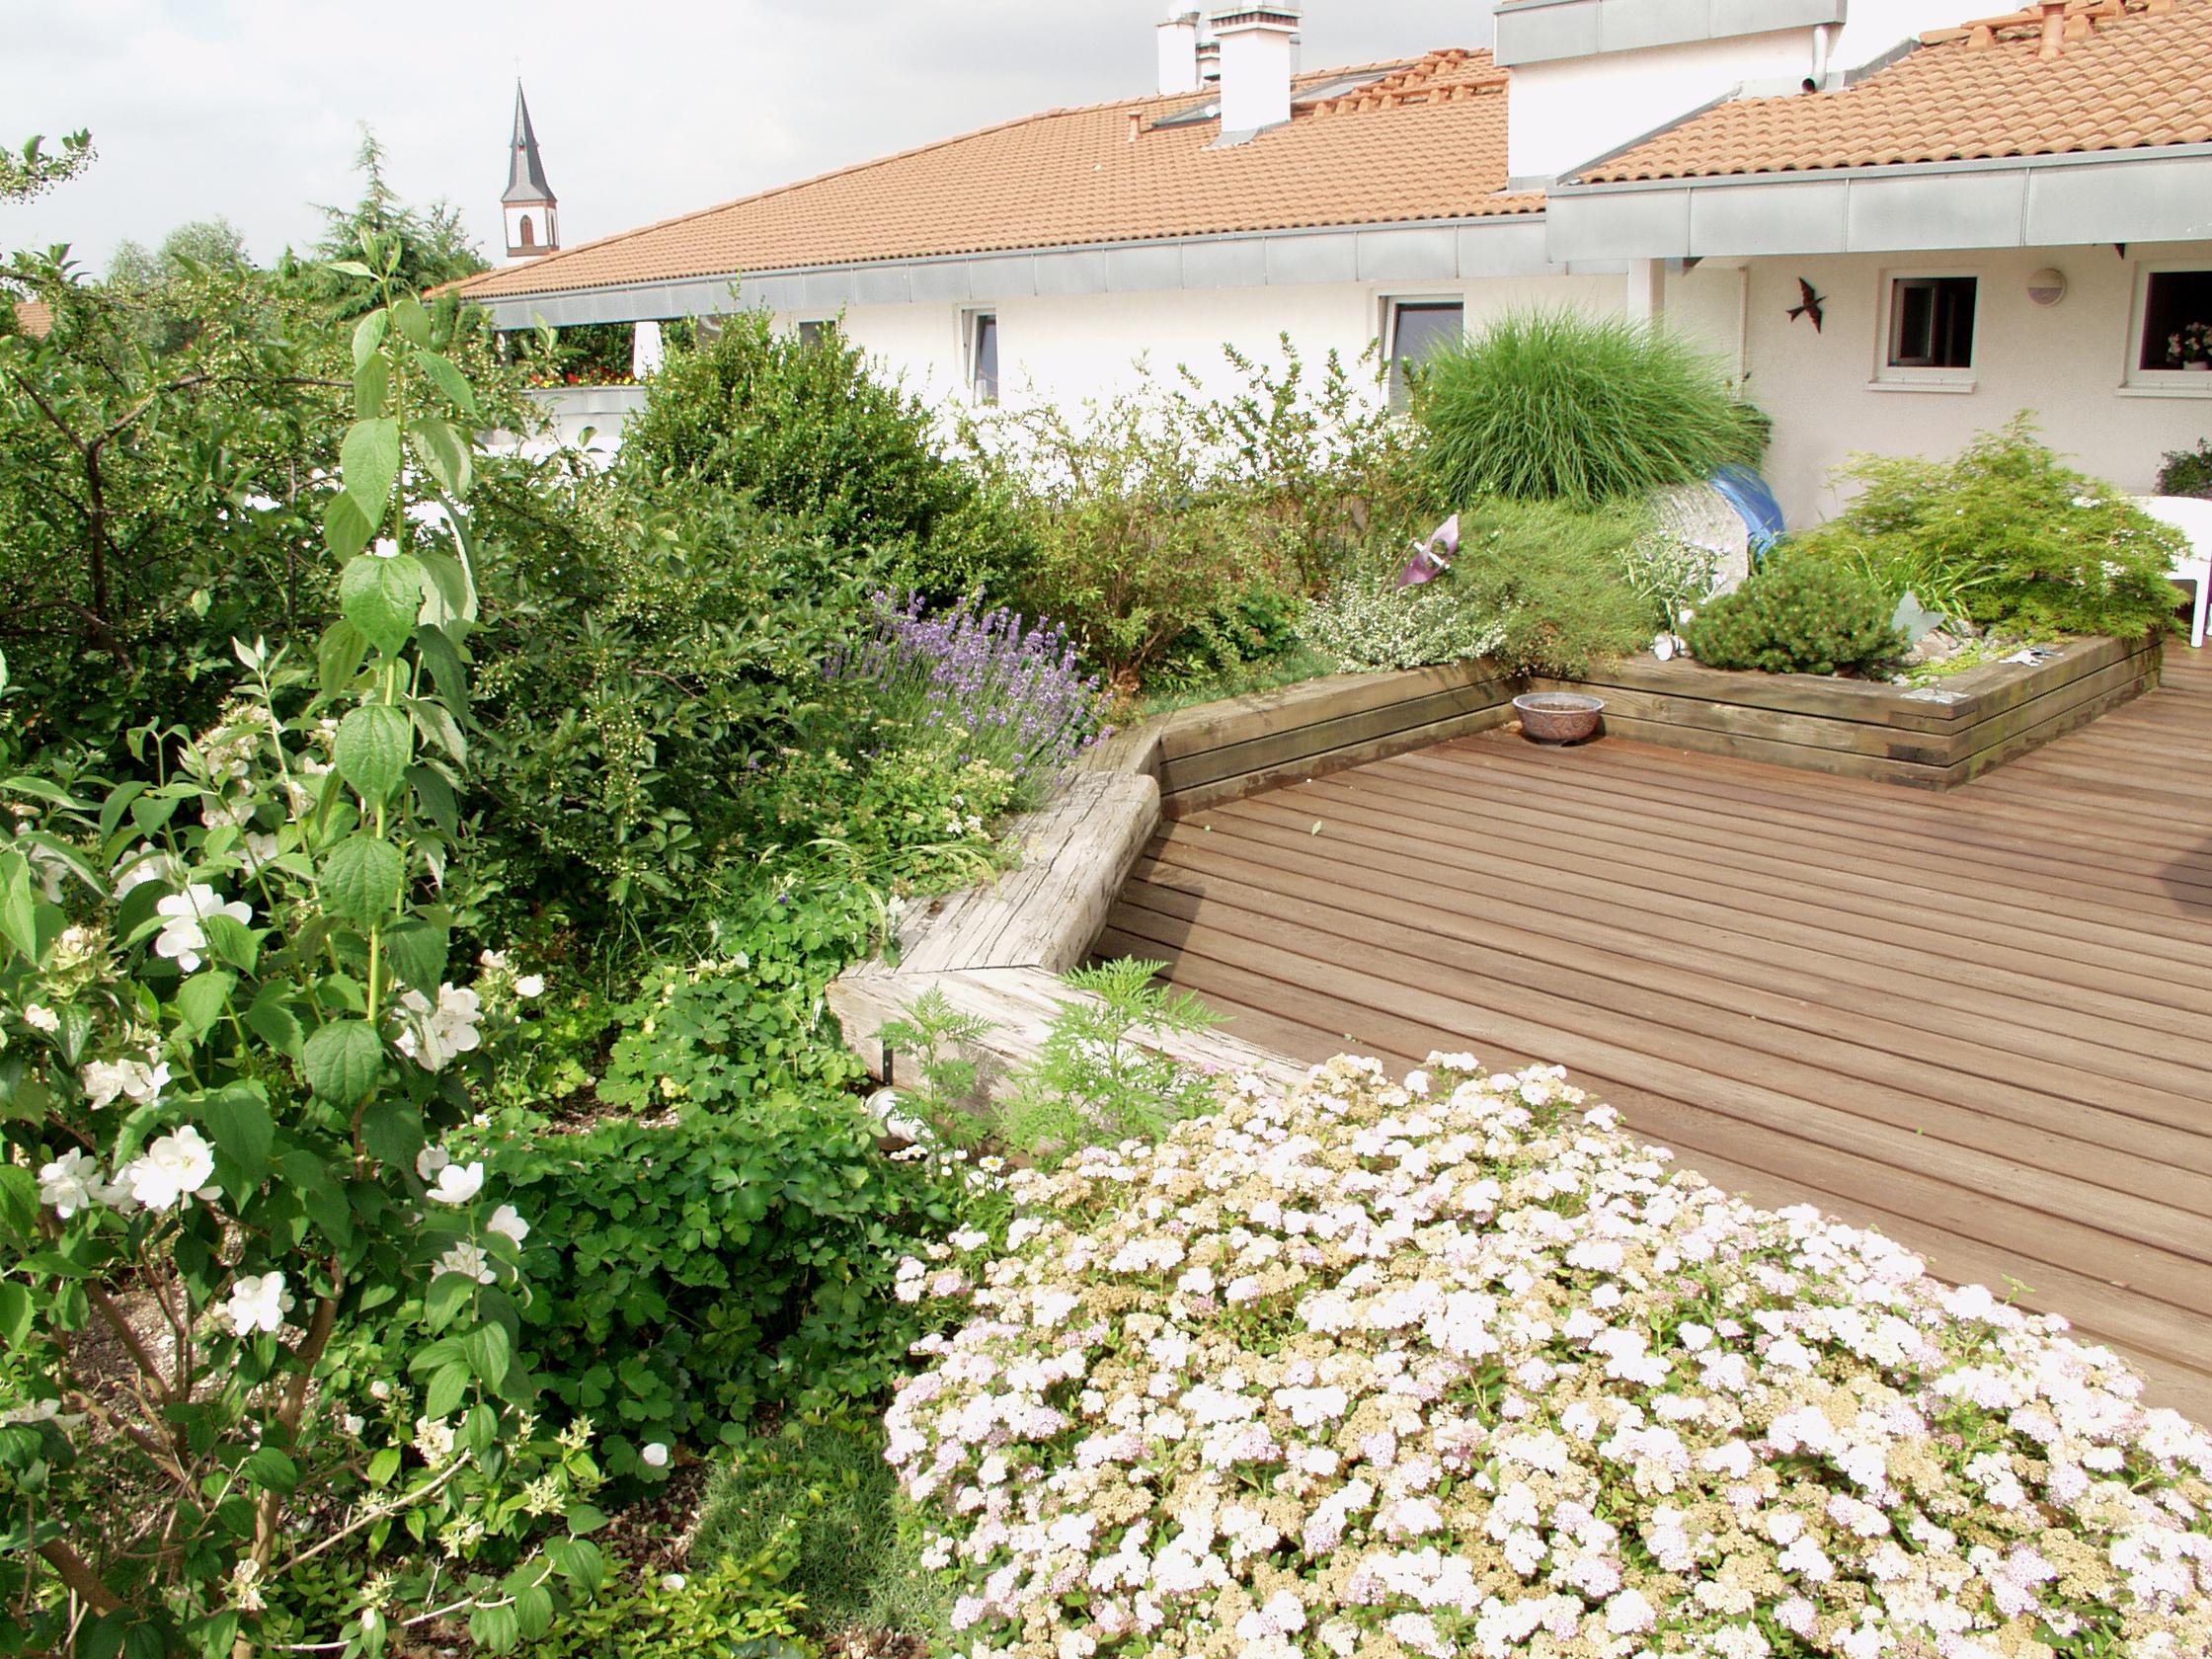 Acoperisuri cu vegetatie extensiva, intensiva BAUDER - Poza 39